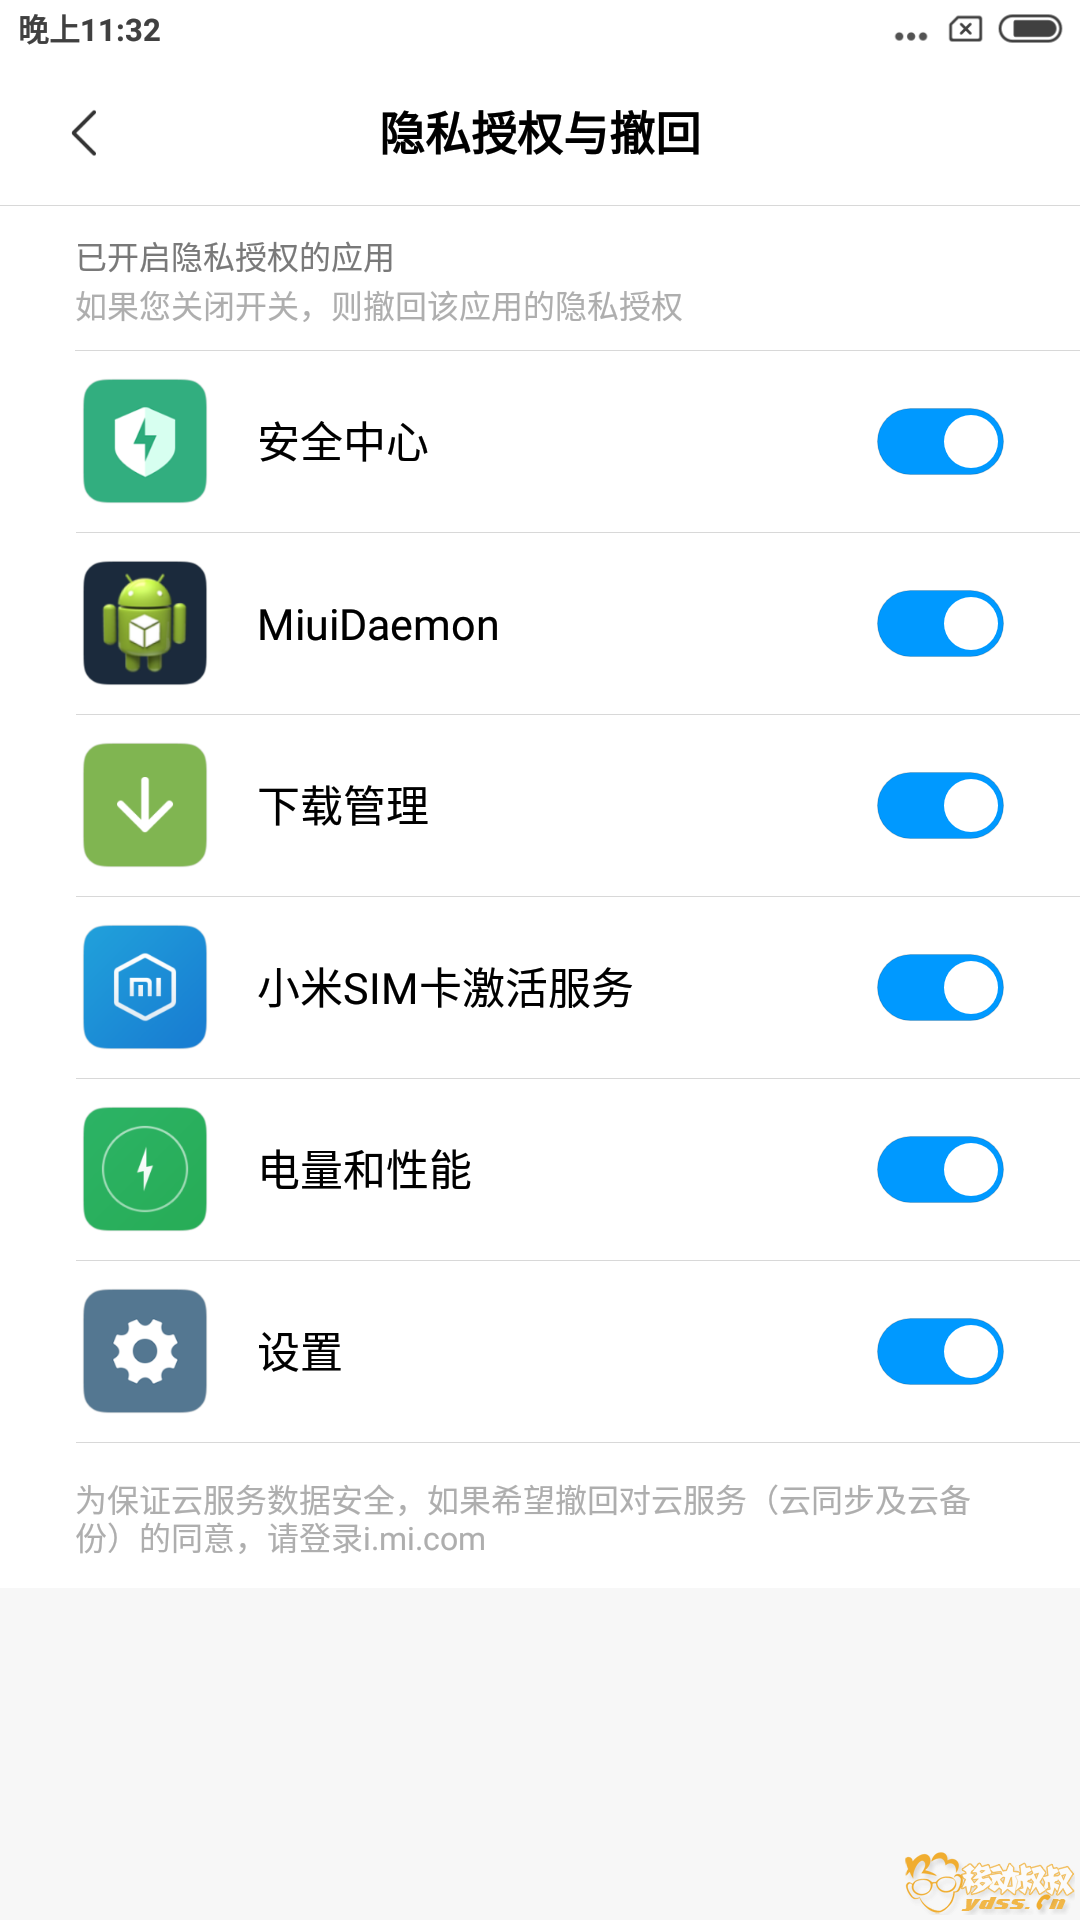 Screenshot_1970-12-26-23-32-56-778_com.android.settings.png